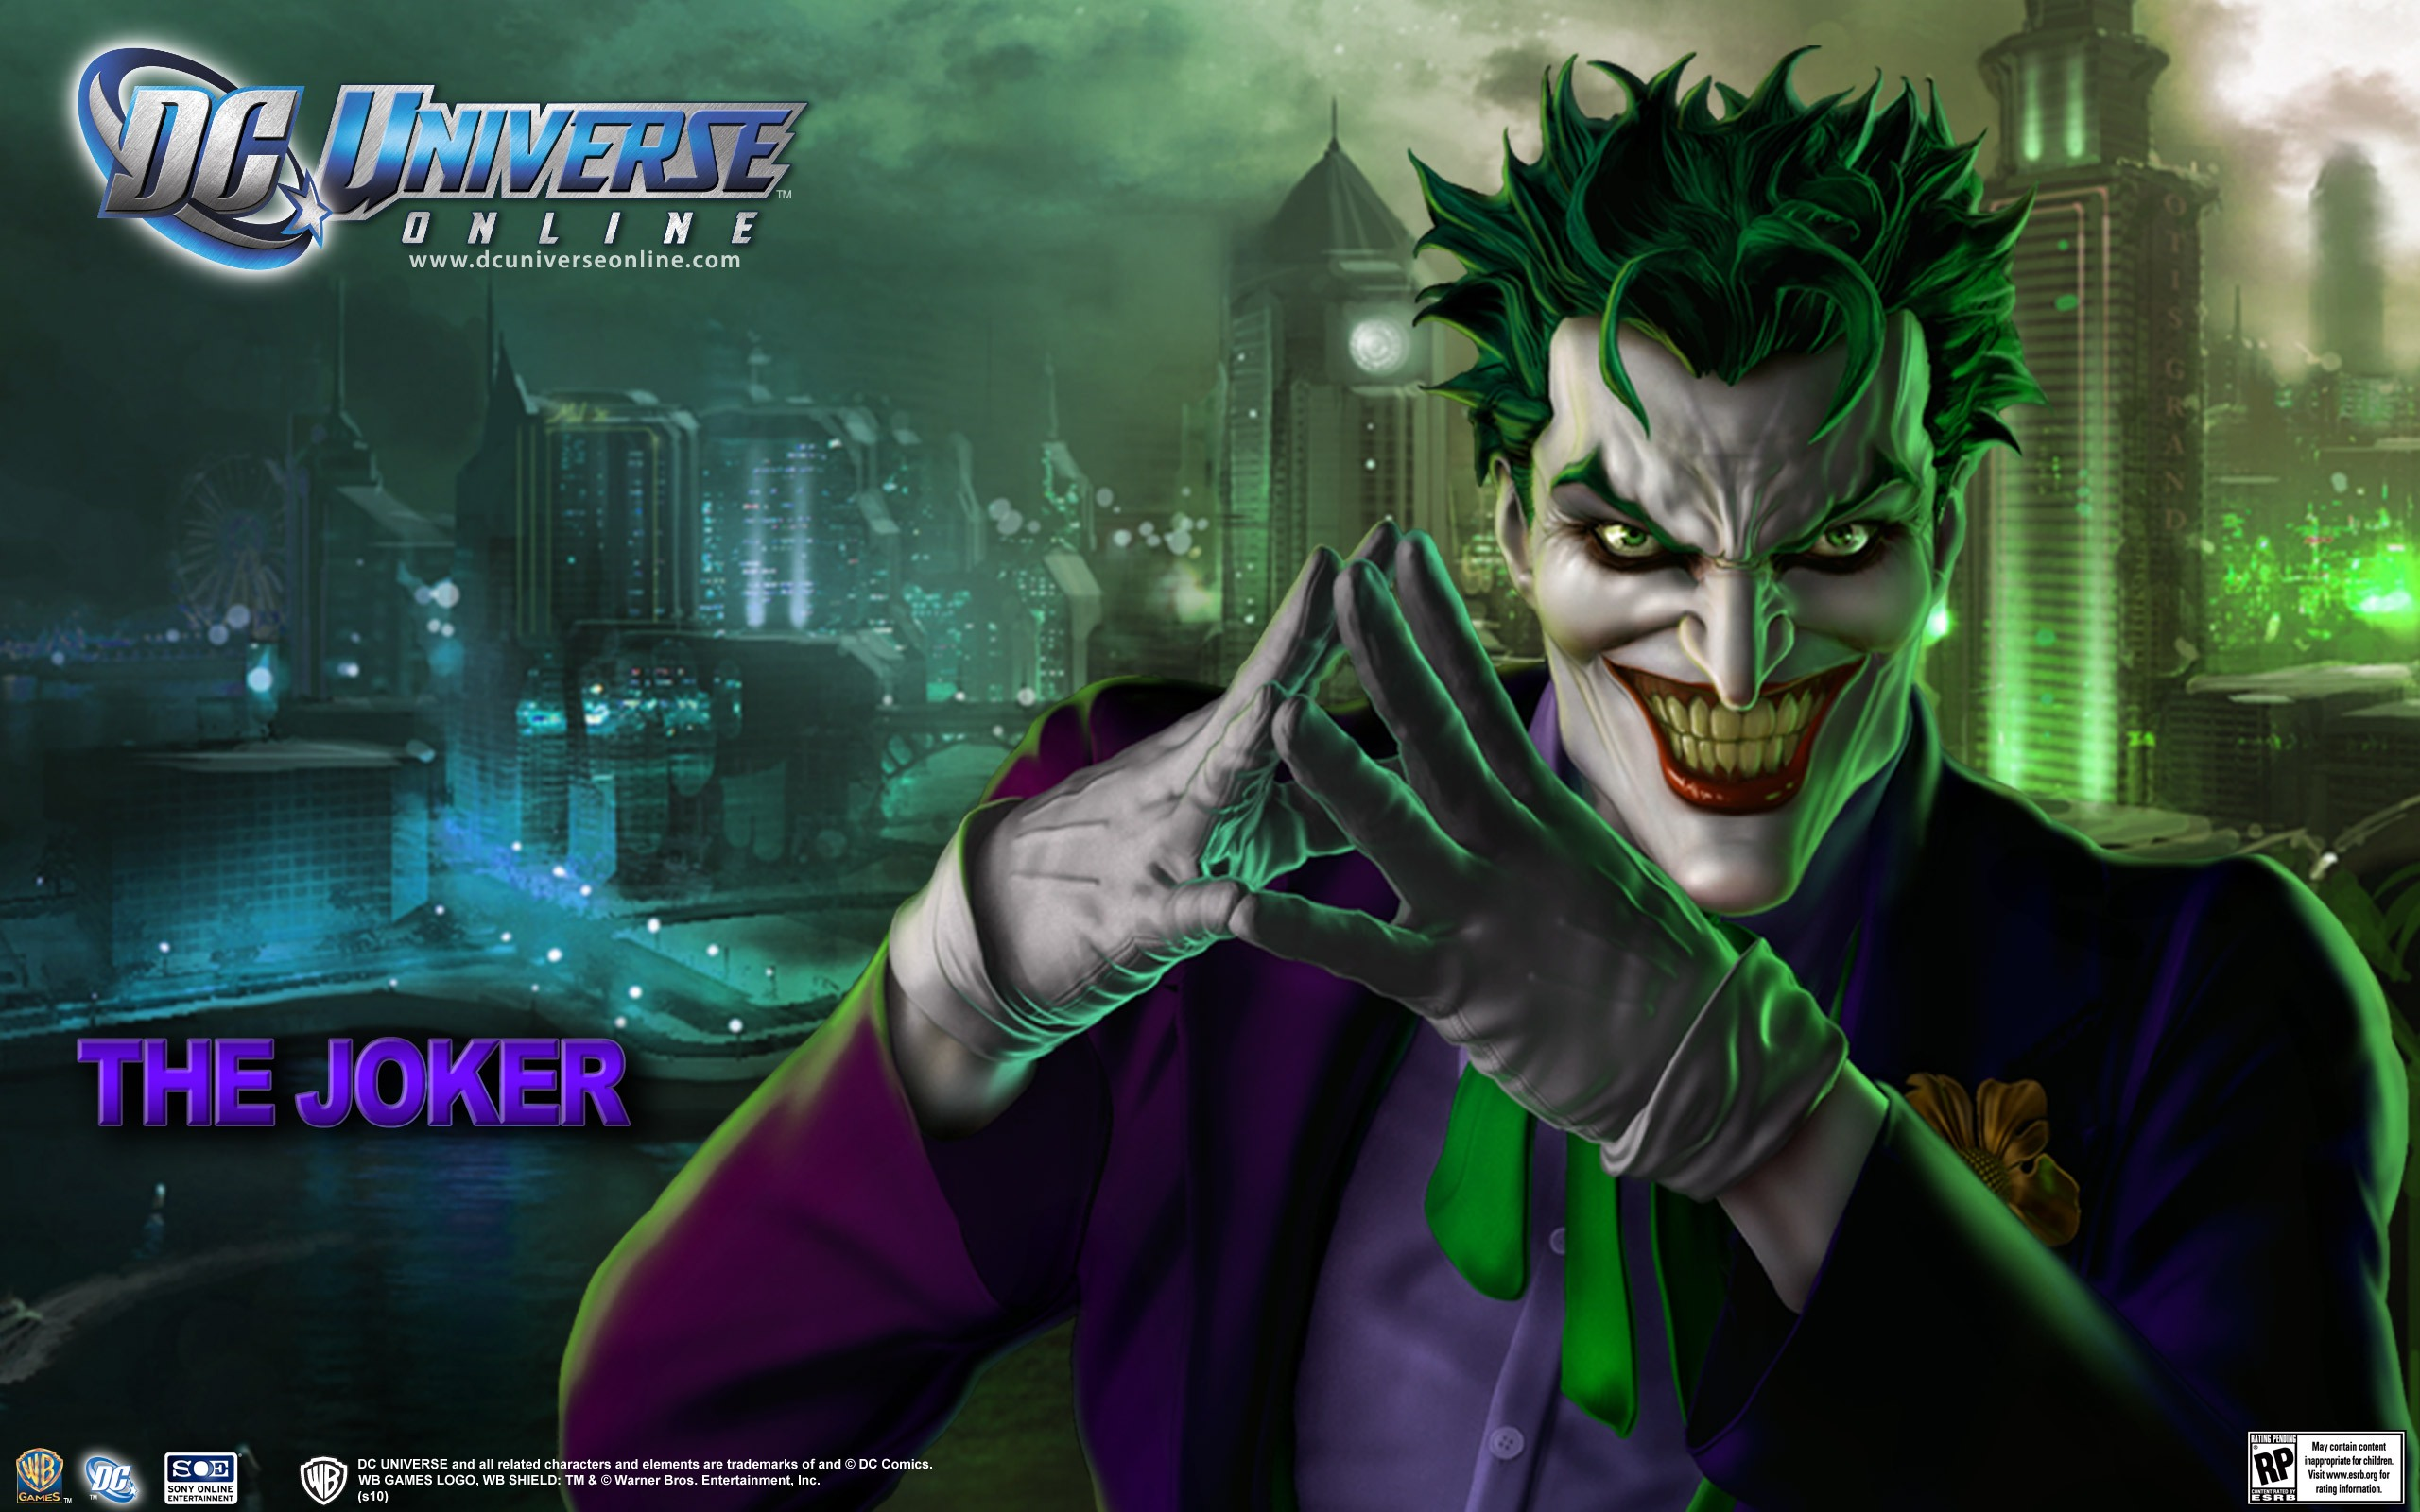 Dc Universe Online Joker Desktop Wallpaper picture 2560x1600